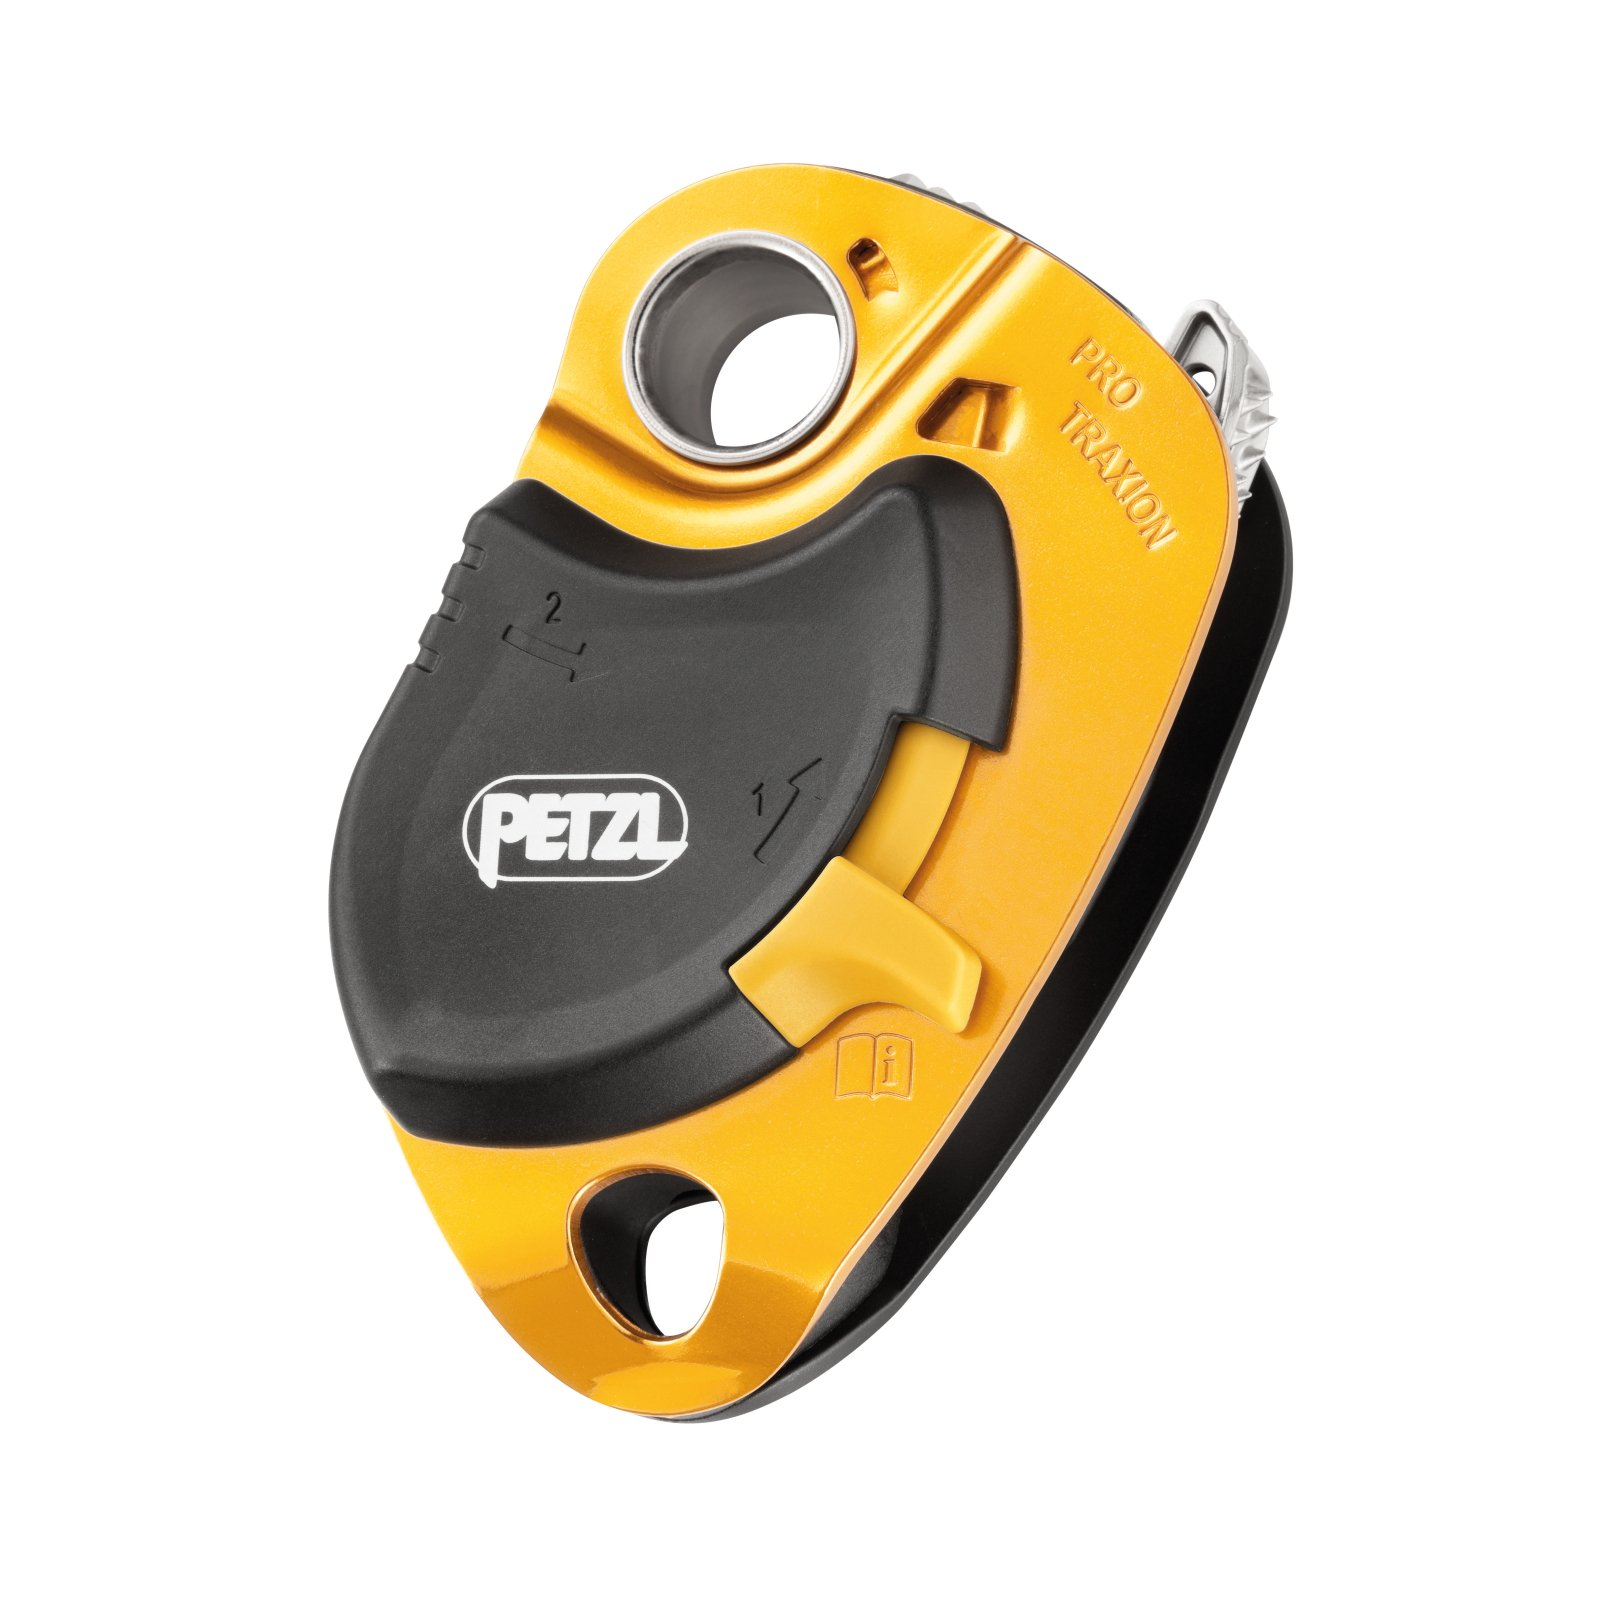 PETZL - PRO Traxion, Loss-Resistant Progress Capture Pulley by PETZL